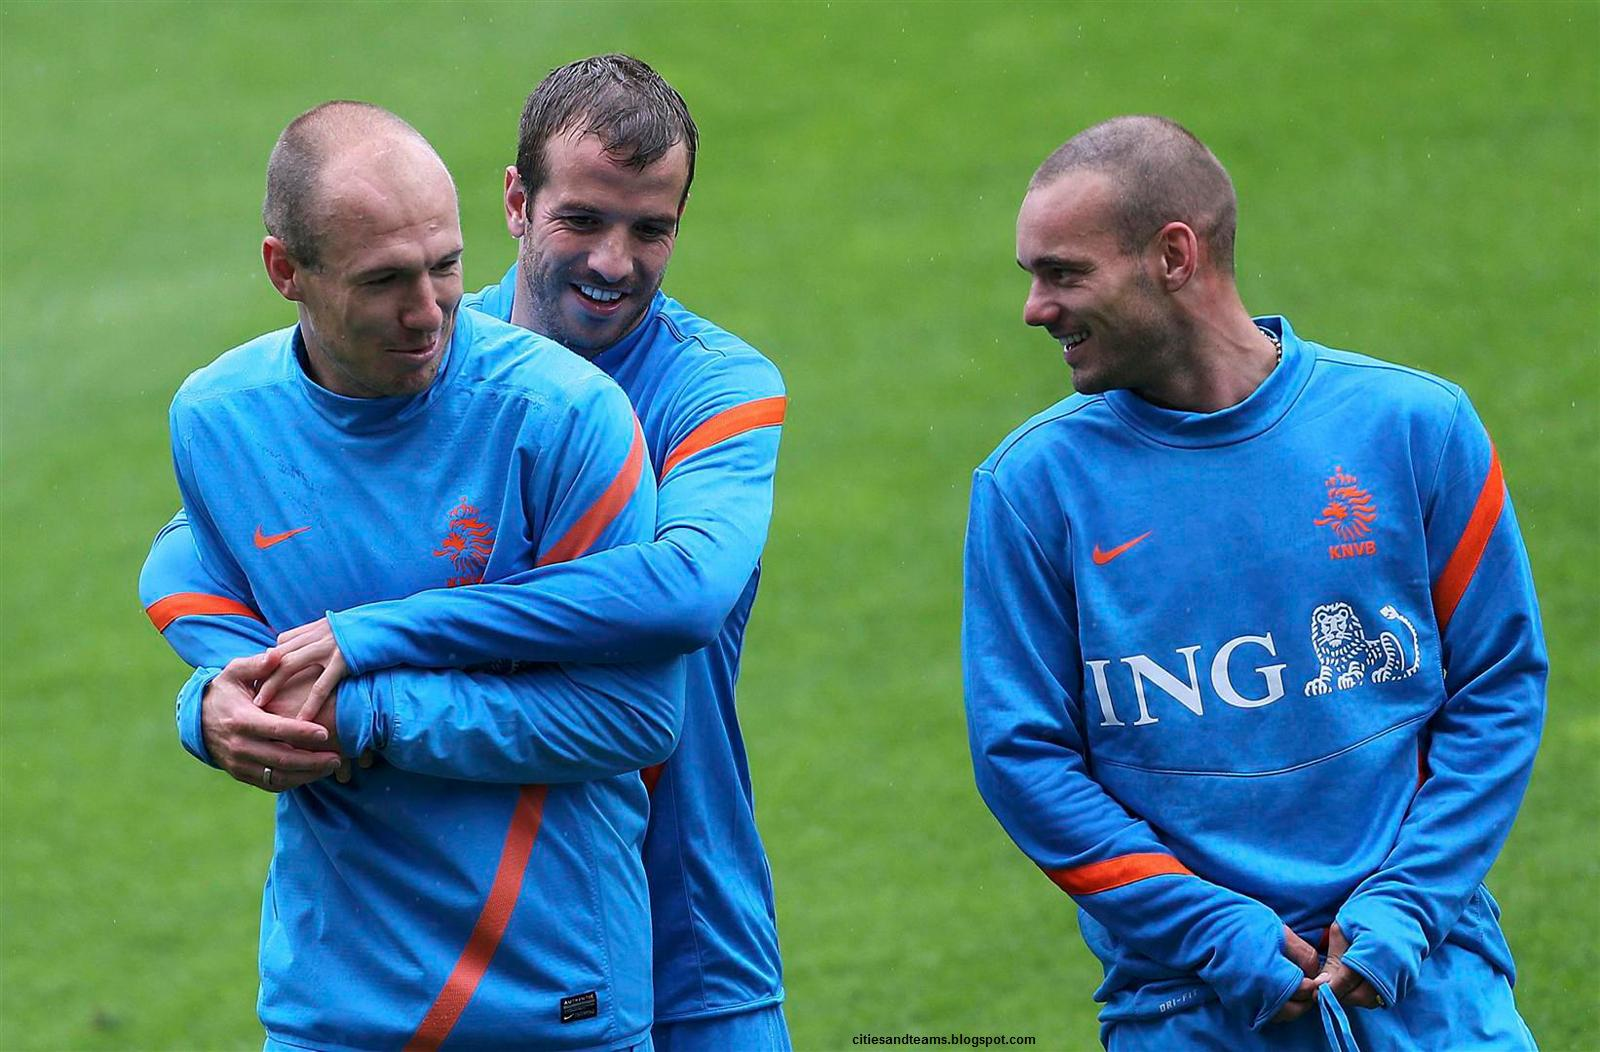 http://2.bp.blogspot.com/-QzLxwCYk94s/T9NhYx_X83I/AAAAAAAAGdg/Pb09YhikITA/s1600/Arjen_Robben_Rafael_Van_der_Vaart_Wesley_Sneijder_Netherlands_Stars_Euro_2012_Hd_Wallpaper_citiesandteams.blogspot.com.jpg